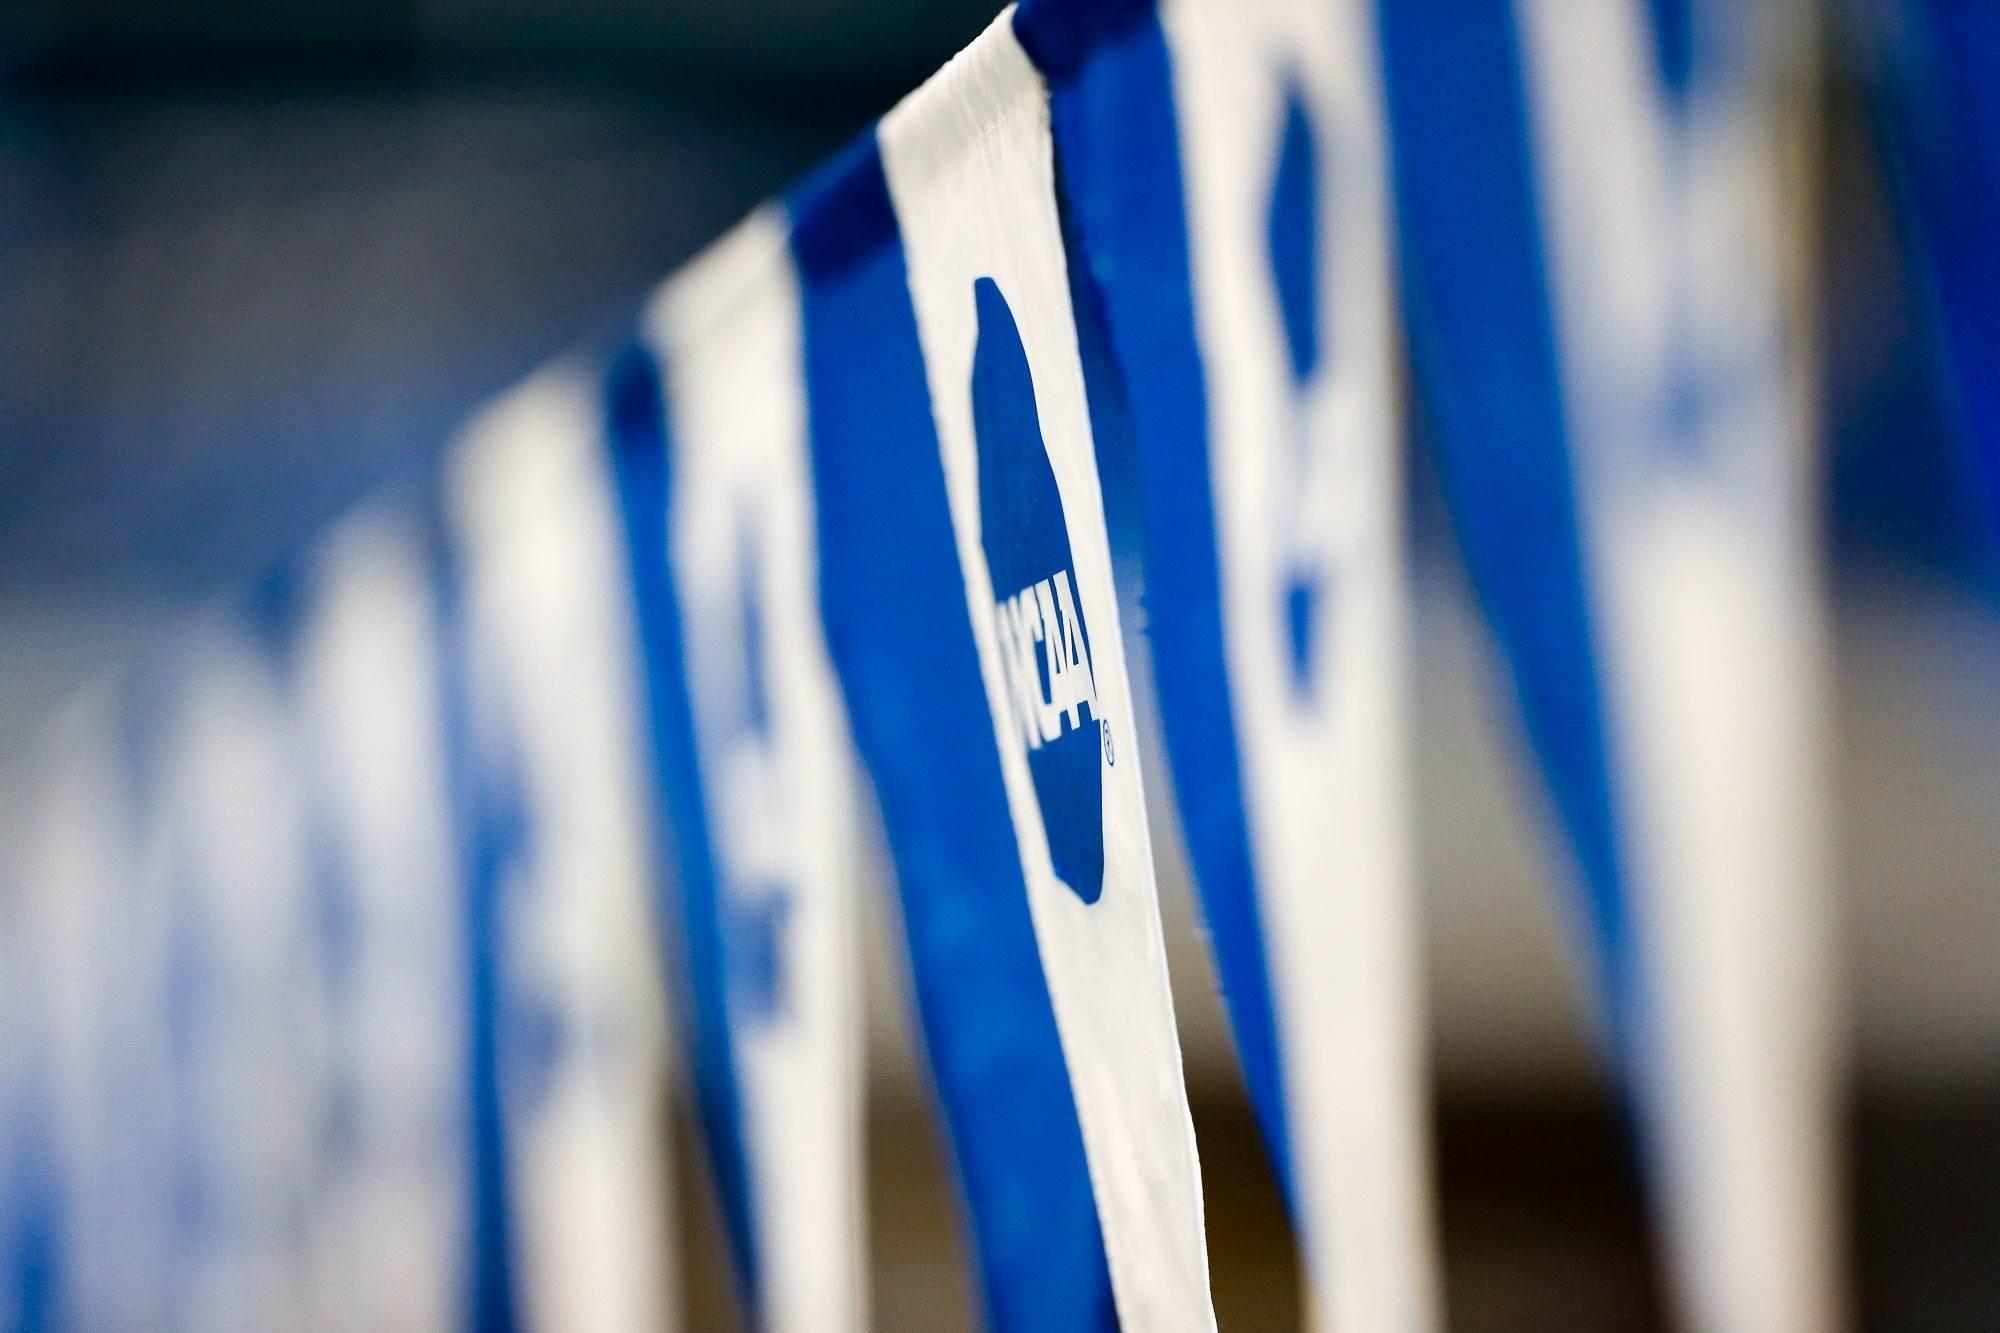 9 Old Dominion Aquatic Club Seniors to Swim in College in